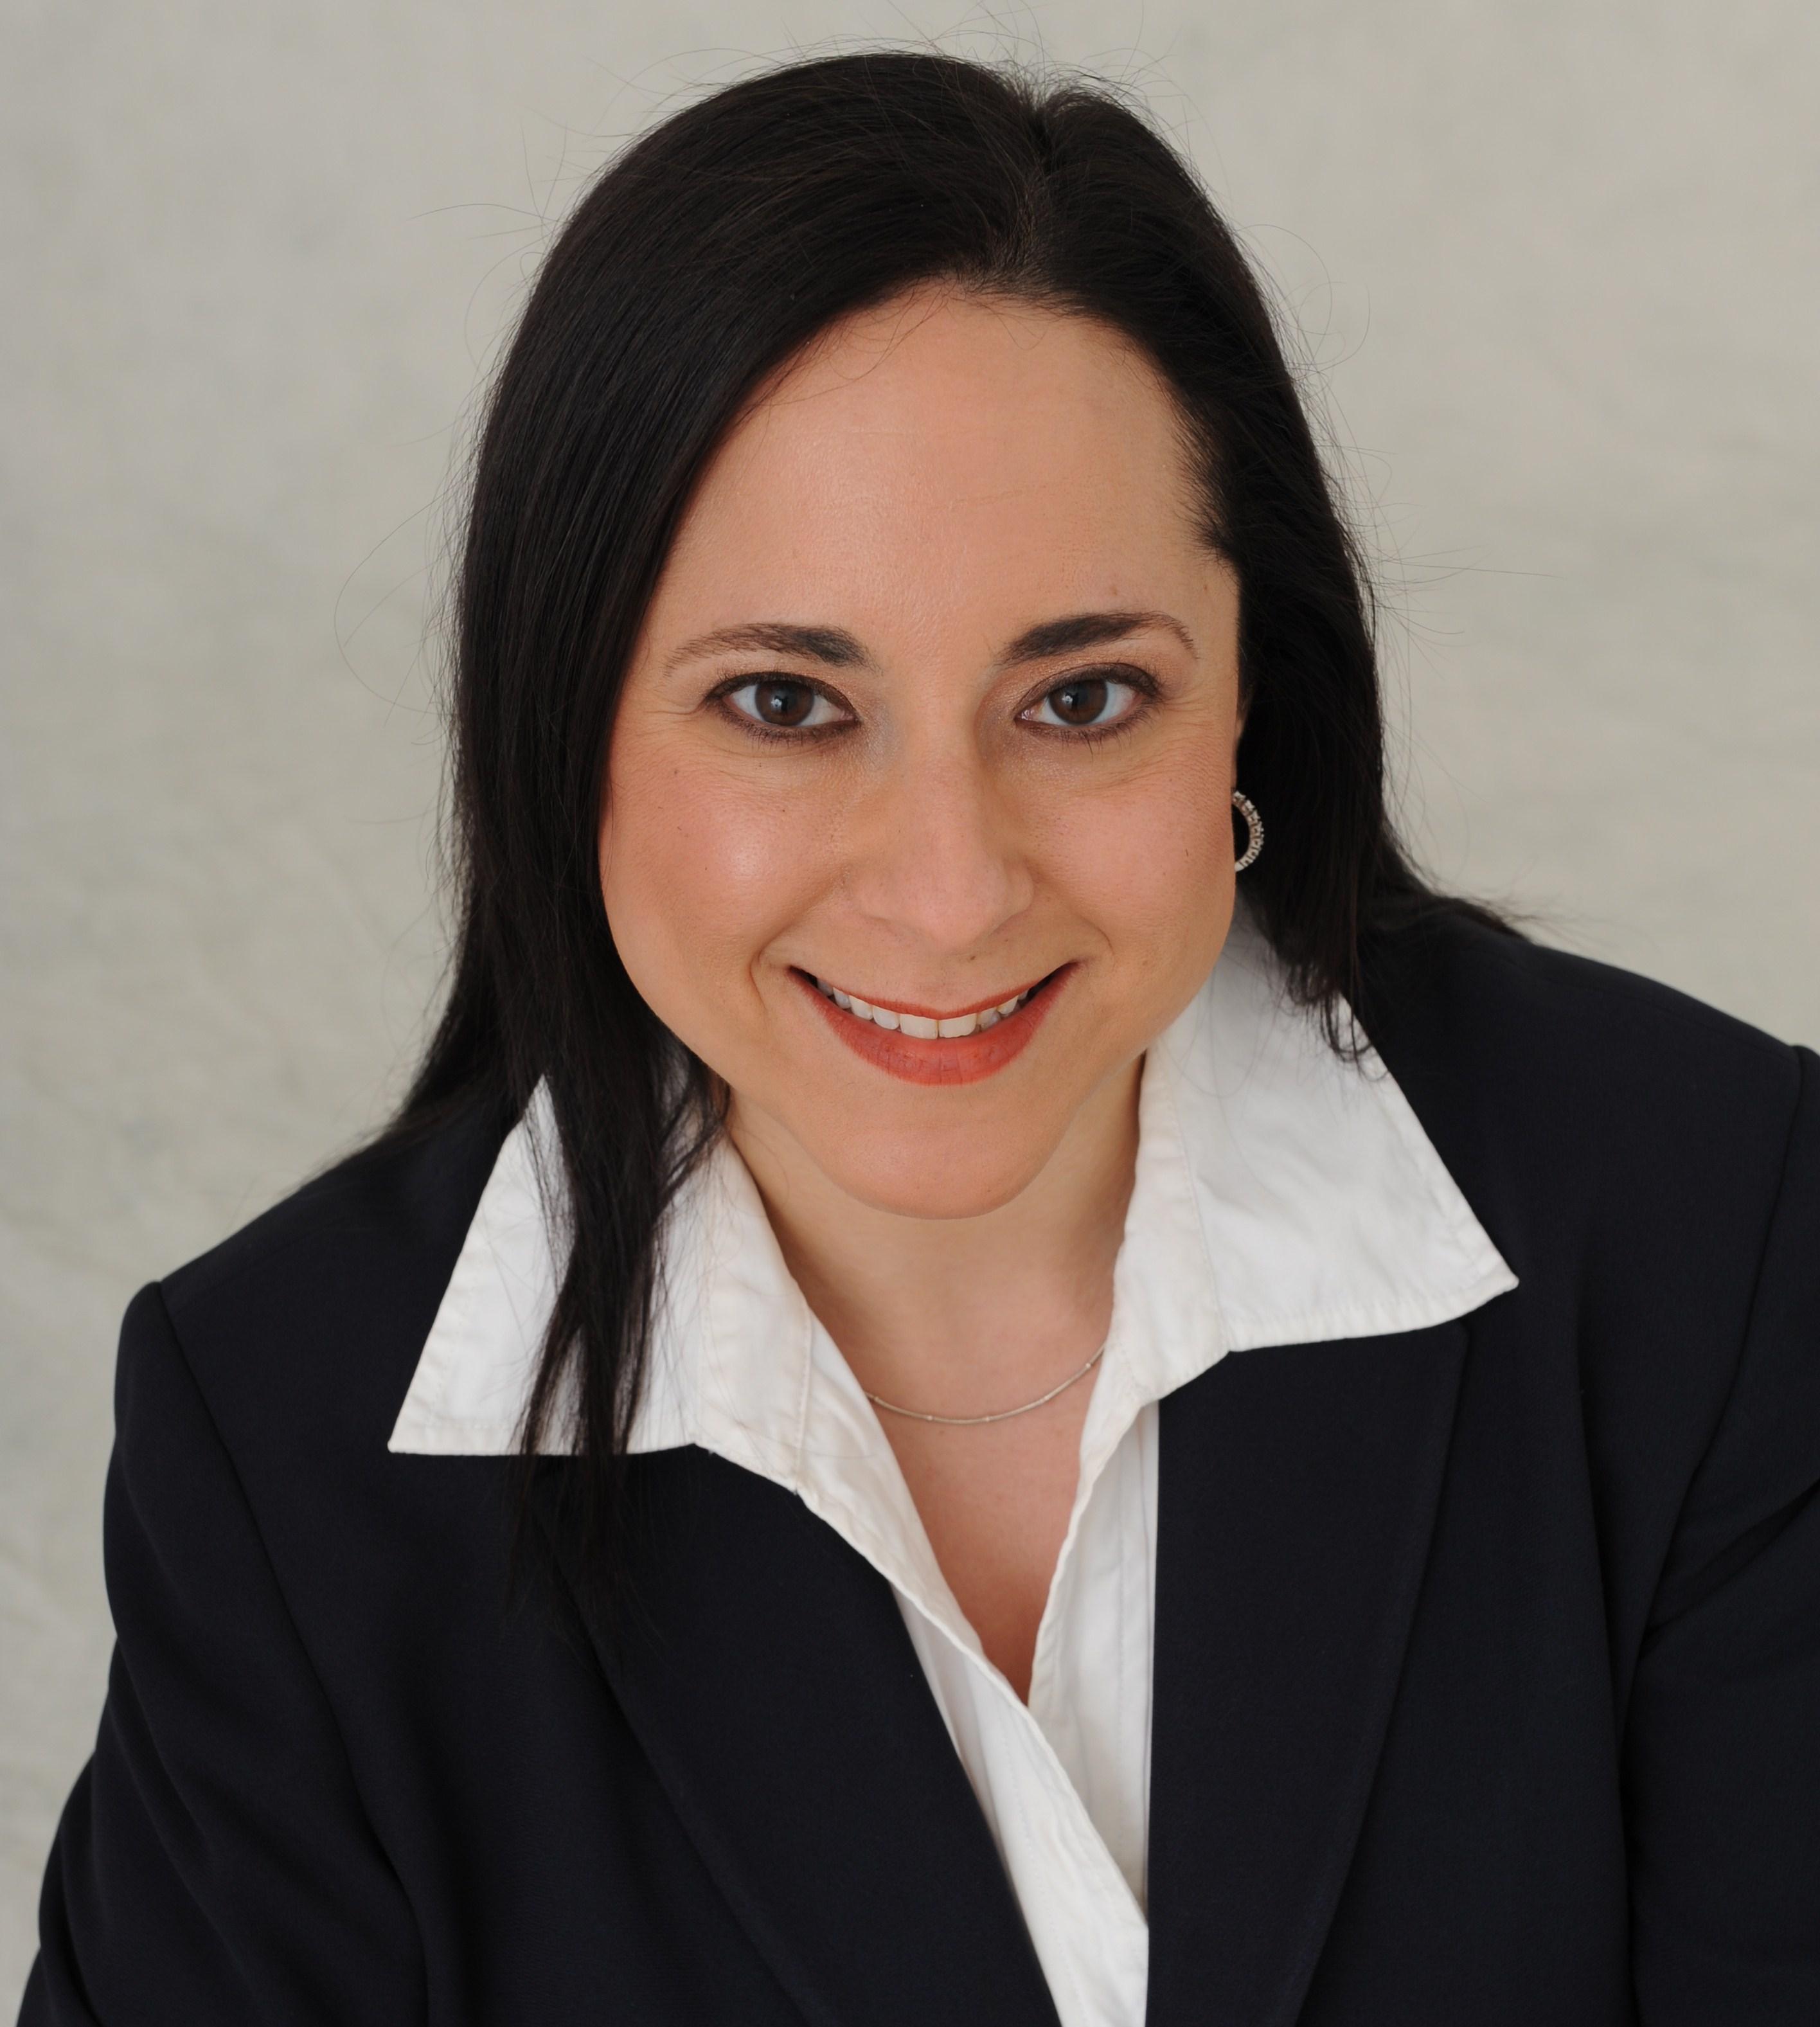 Sabra Sasson